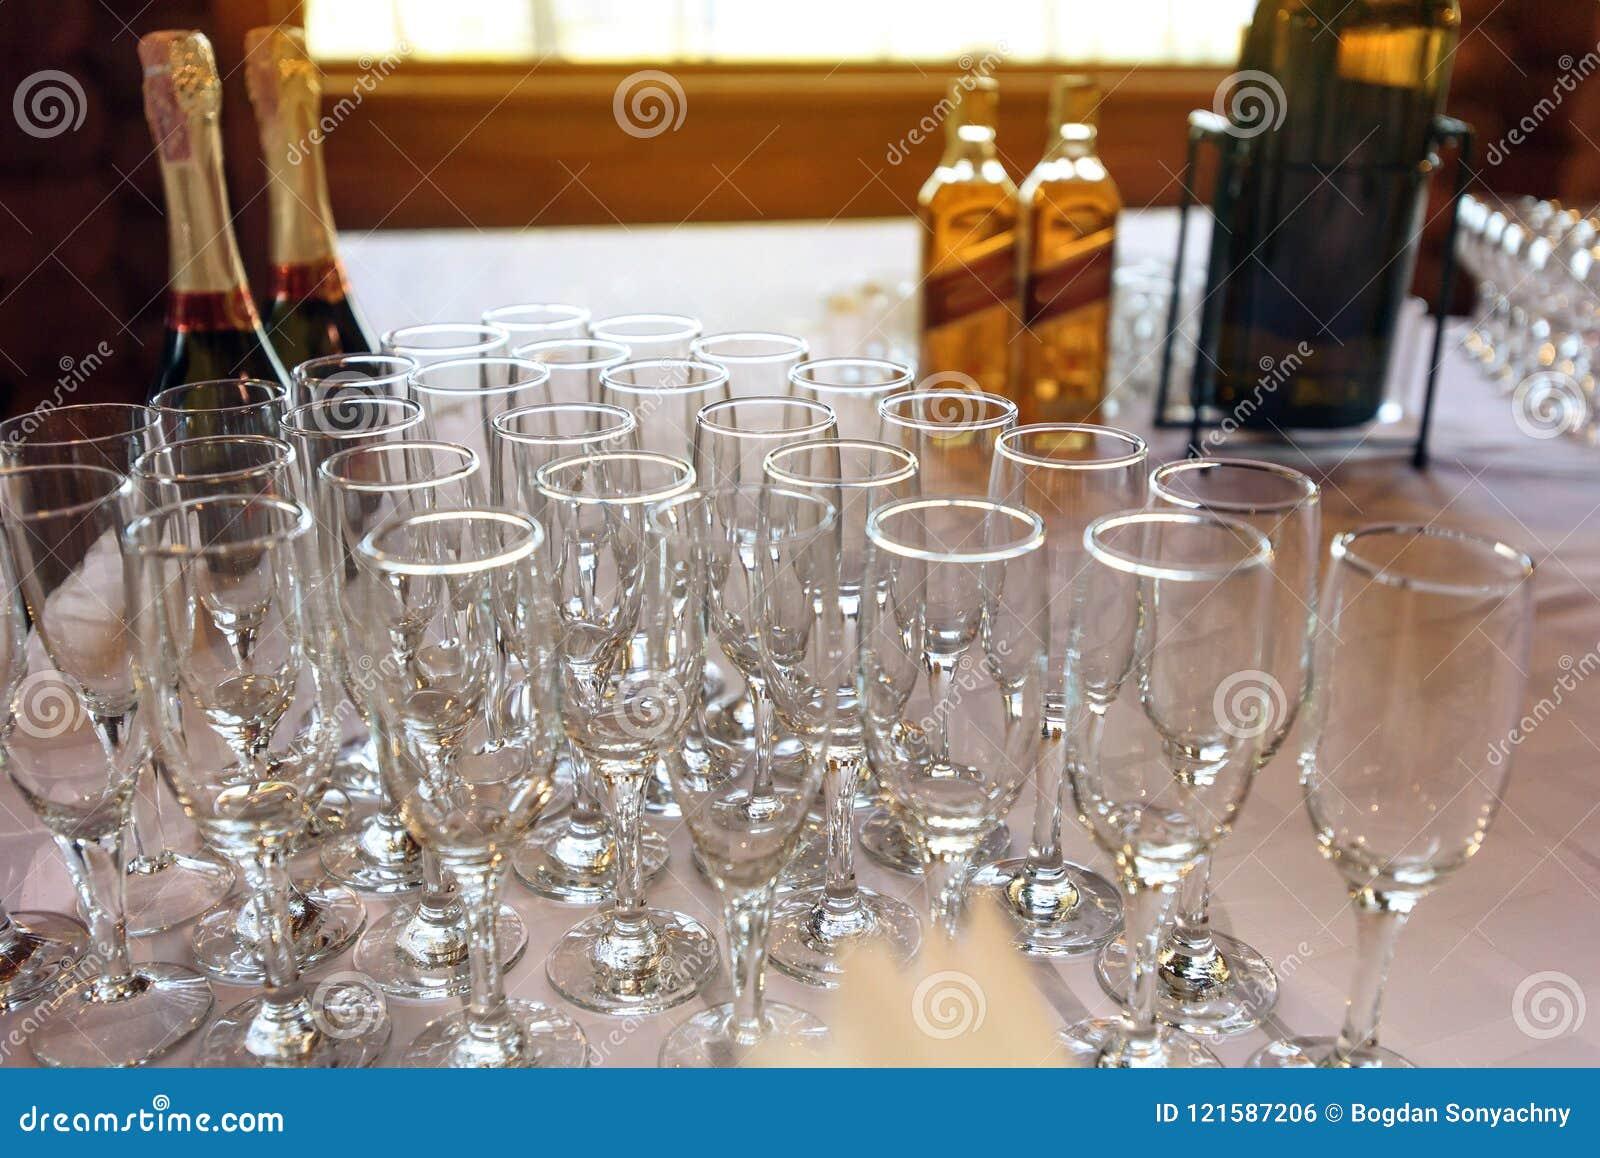 Stylish Glasses At Alcohol Bar Table At Luxury Wedding Reception